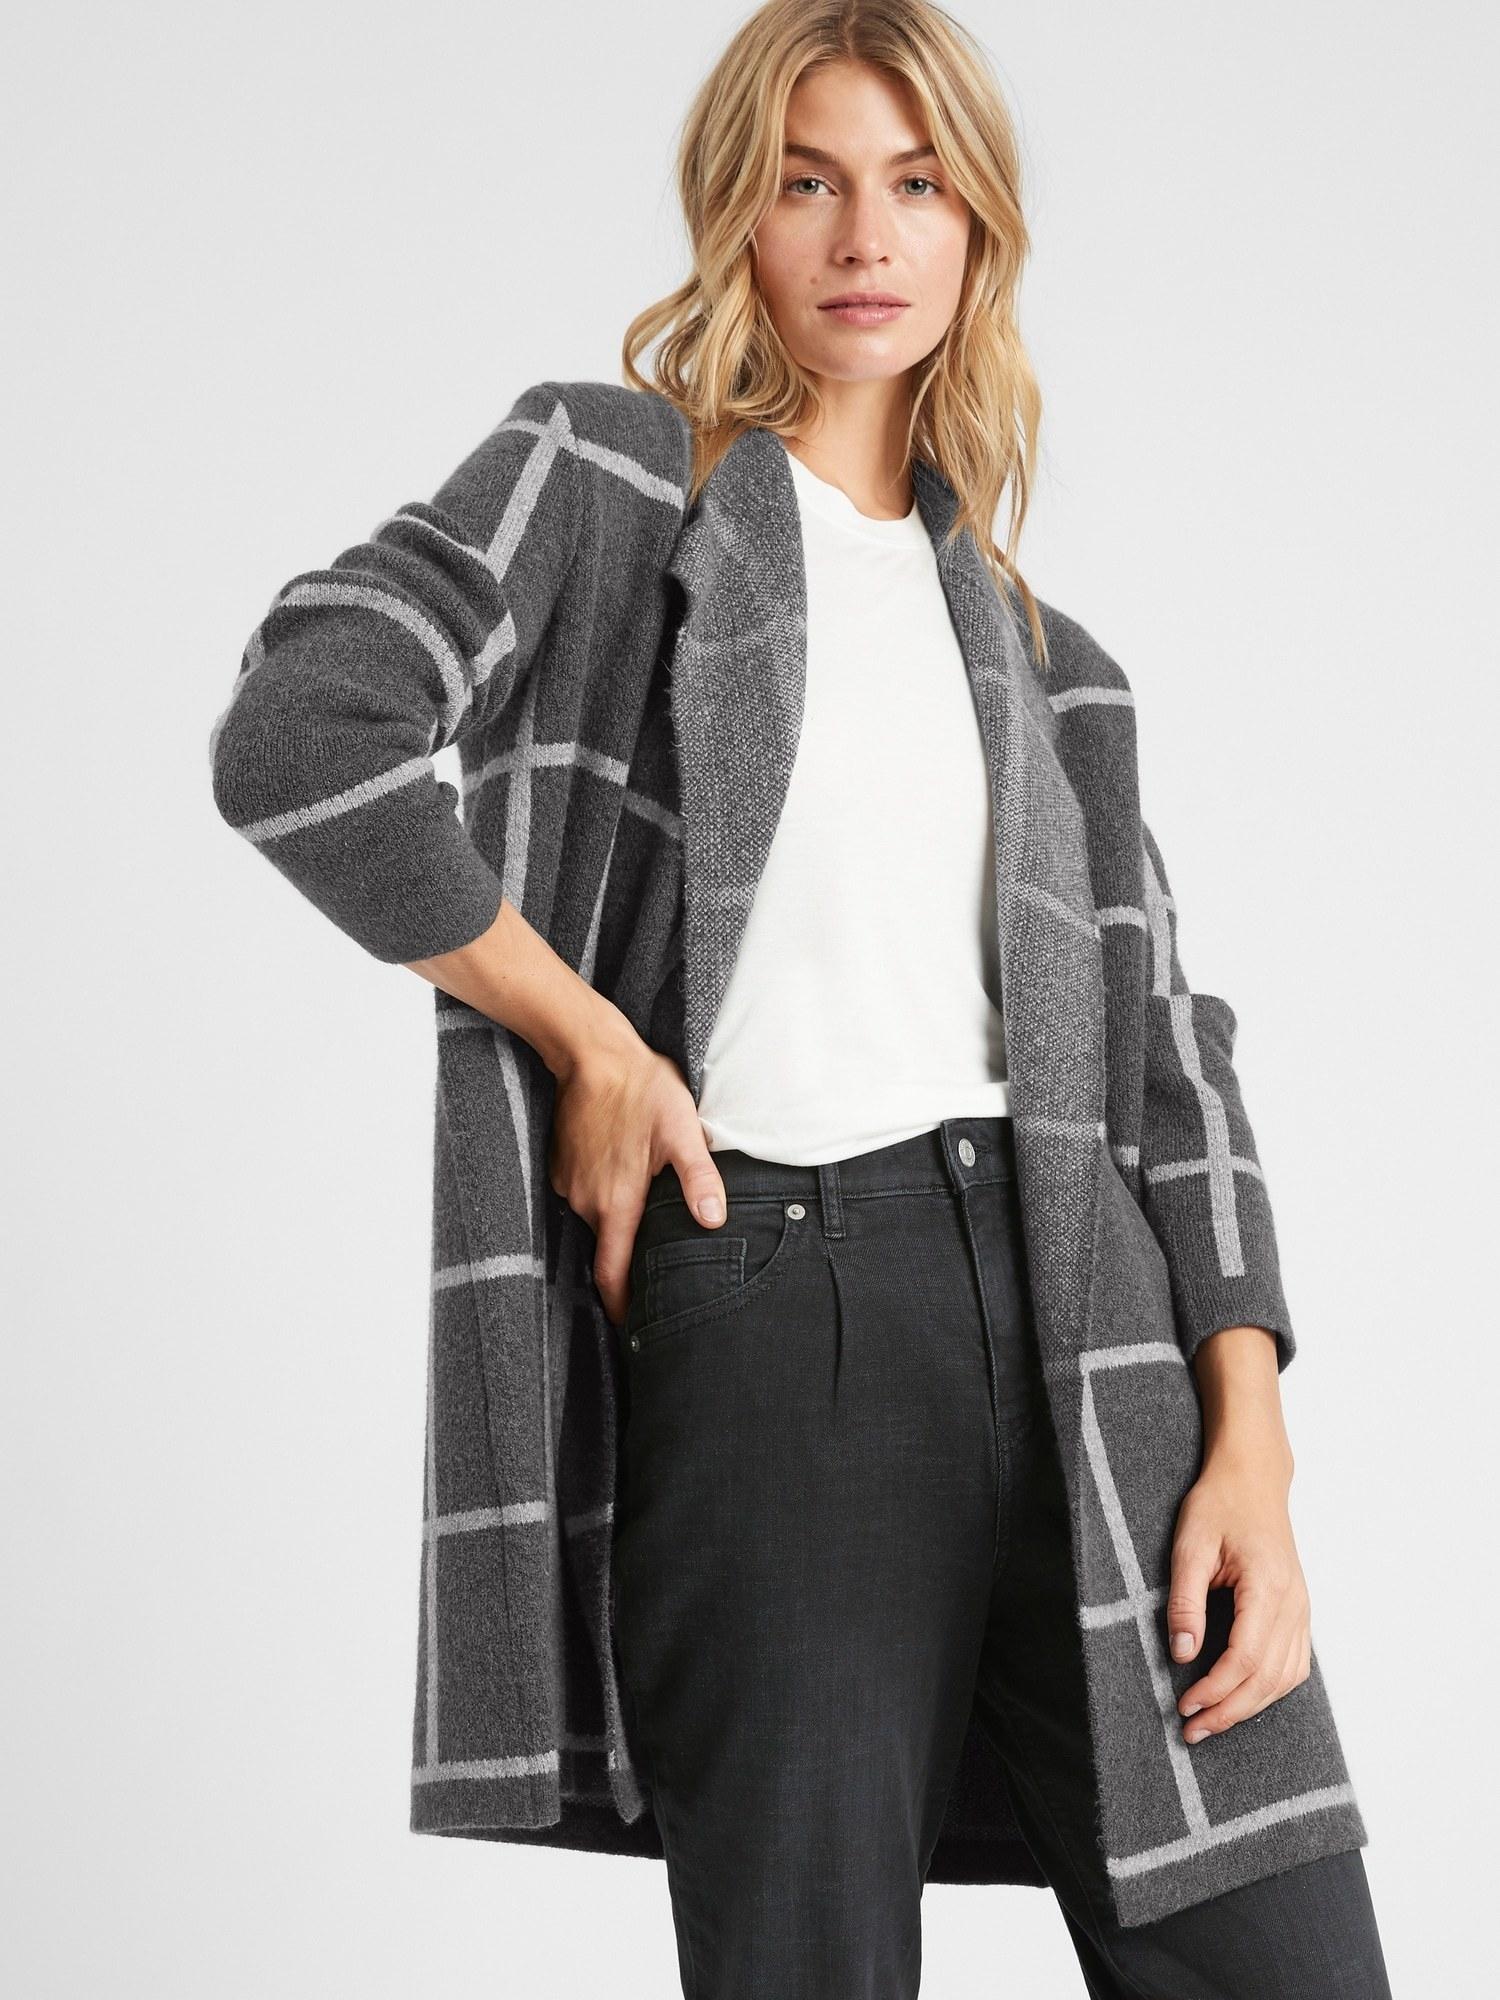 model wearing grid open-front cardigan in charcoal grey